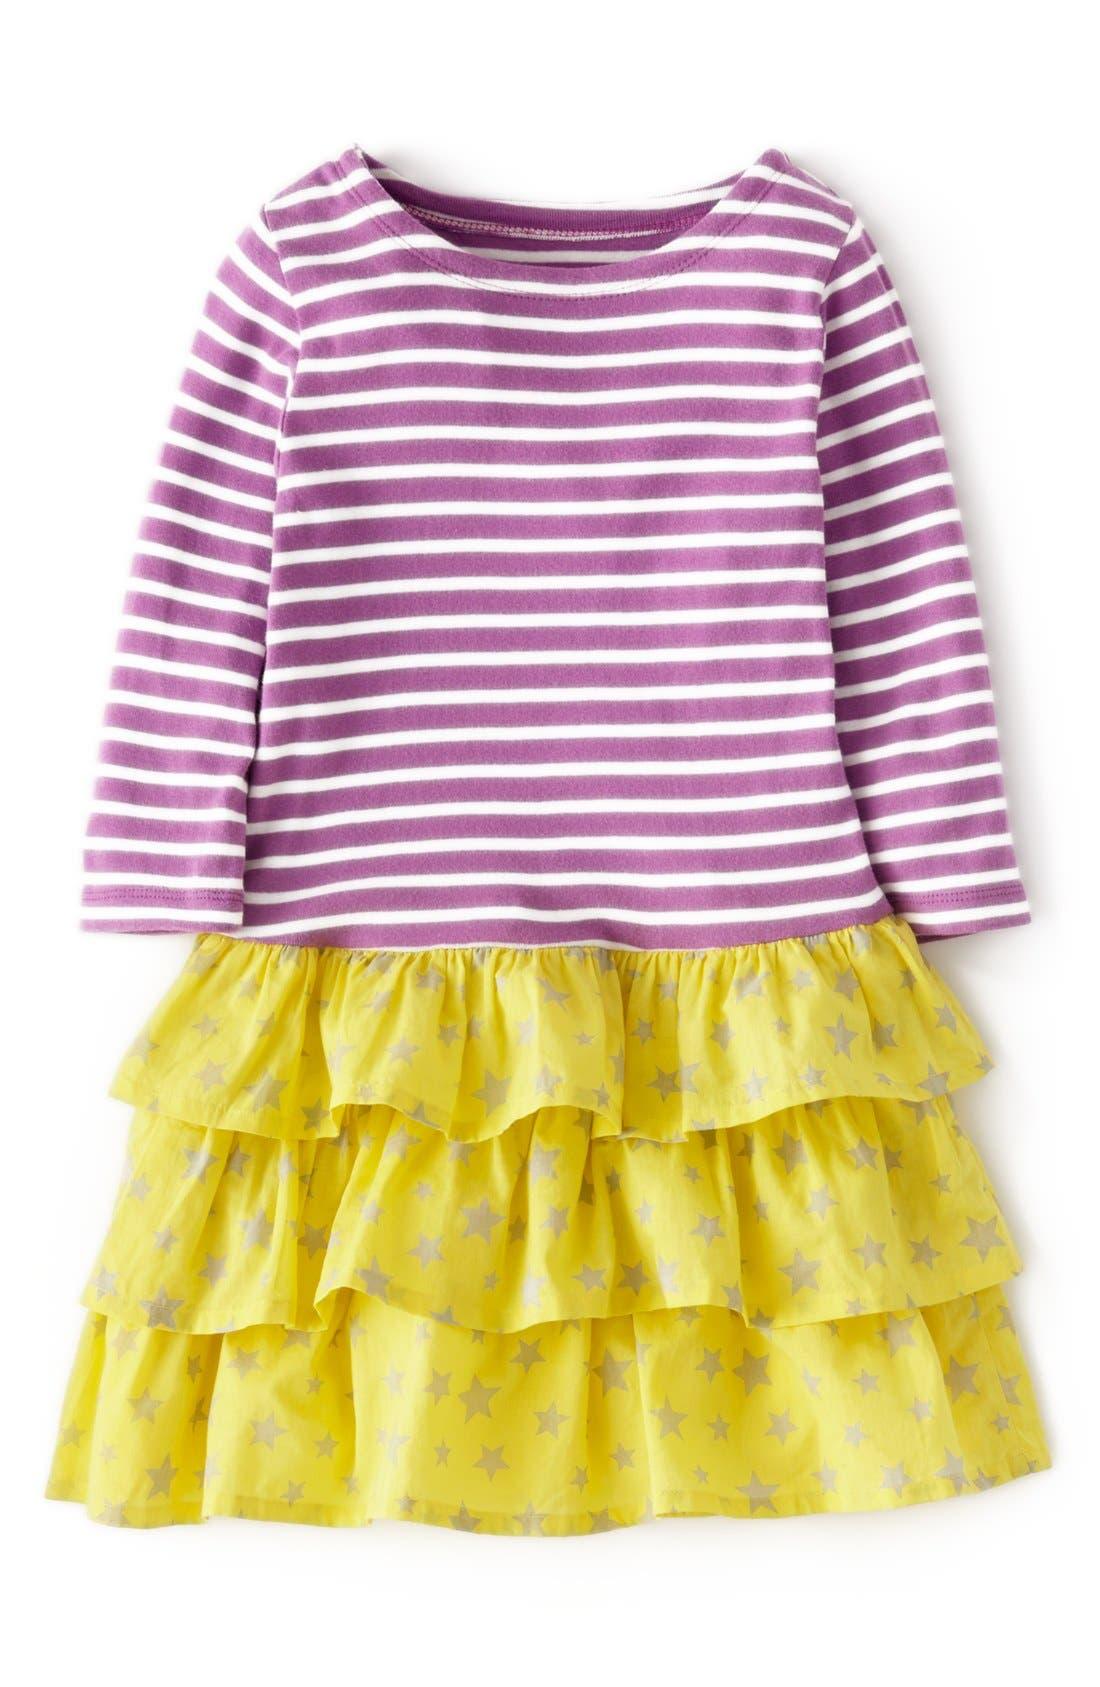 Main Image - Mini Boden Stripy Ruffle Dress (Toddler Girls, Little Girls & Big Girls)(Online Only)